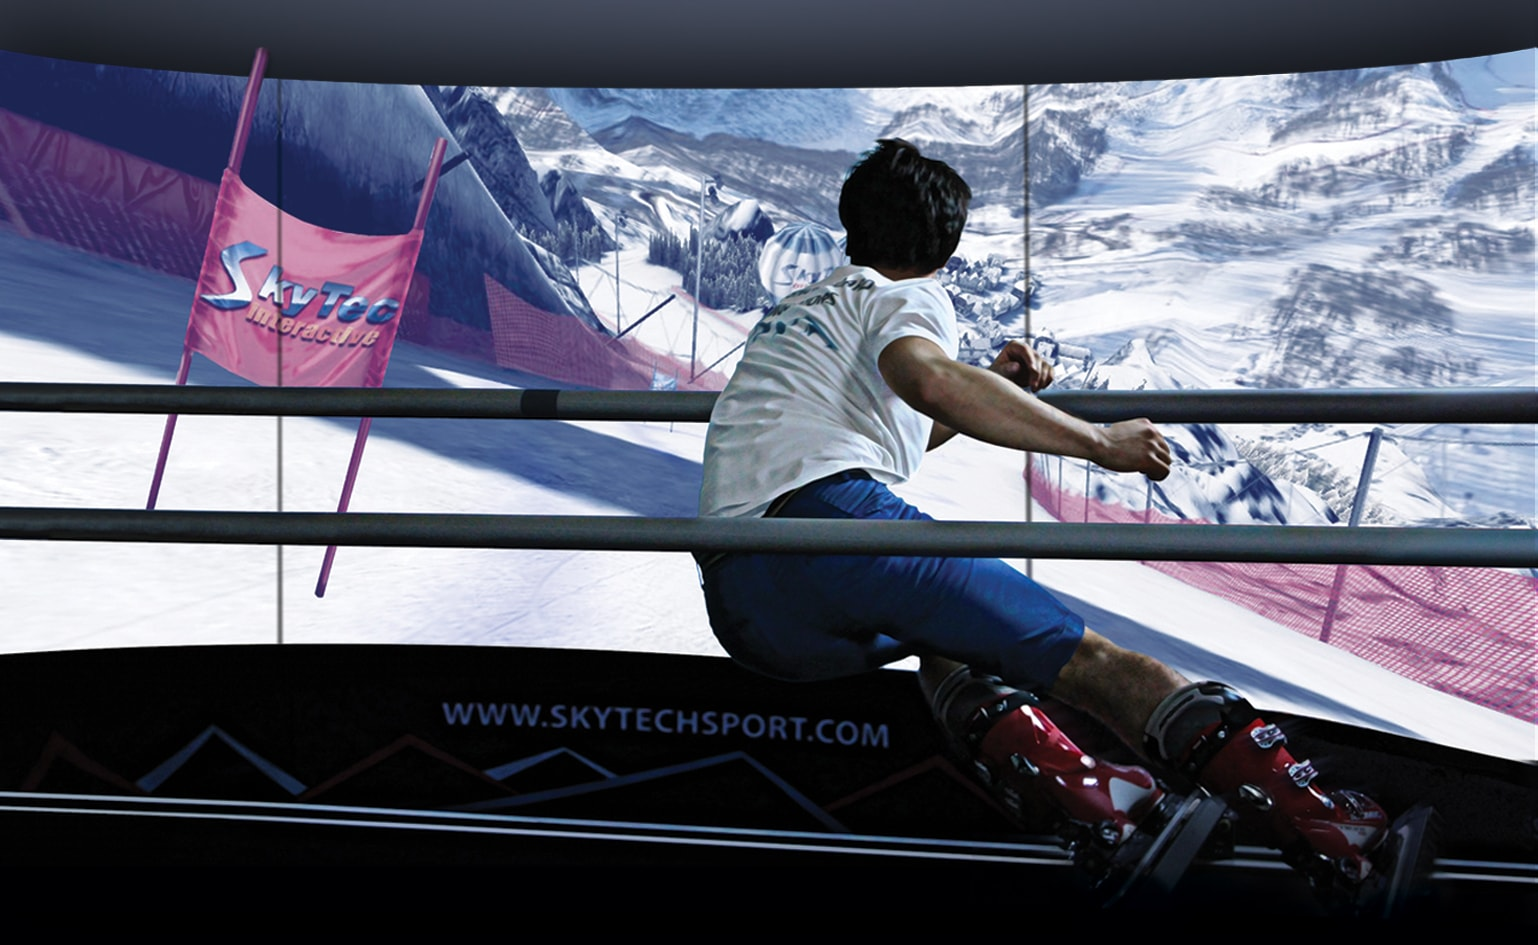 Skiing on a SkyTechSport Simulator